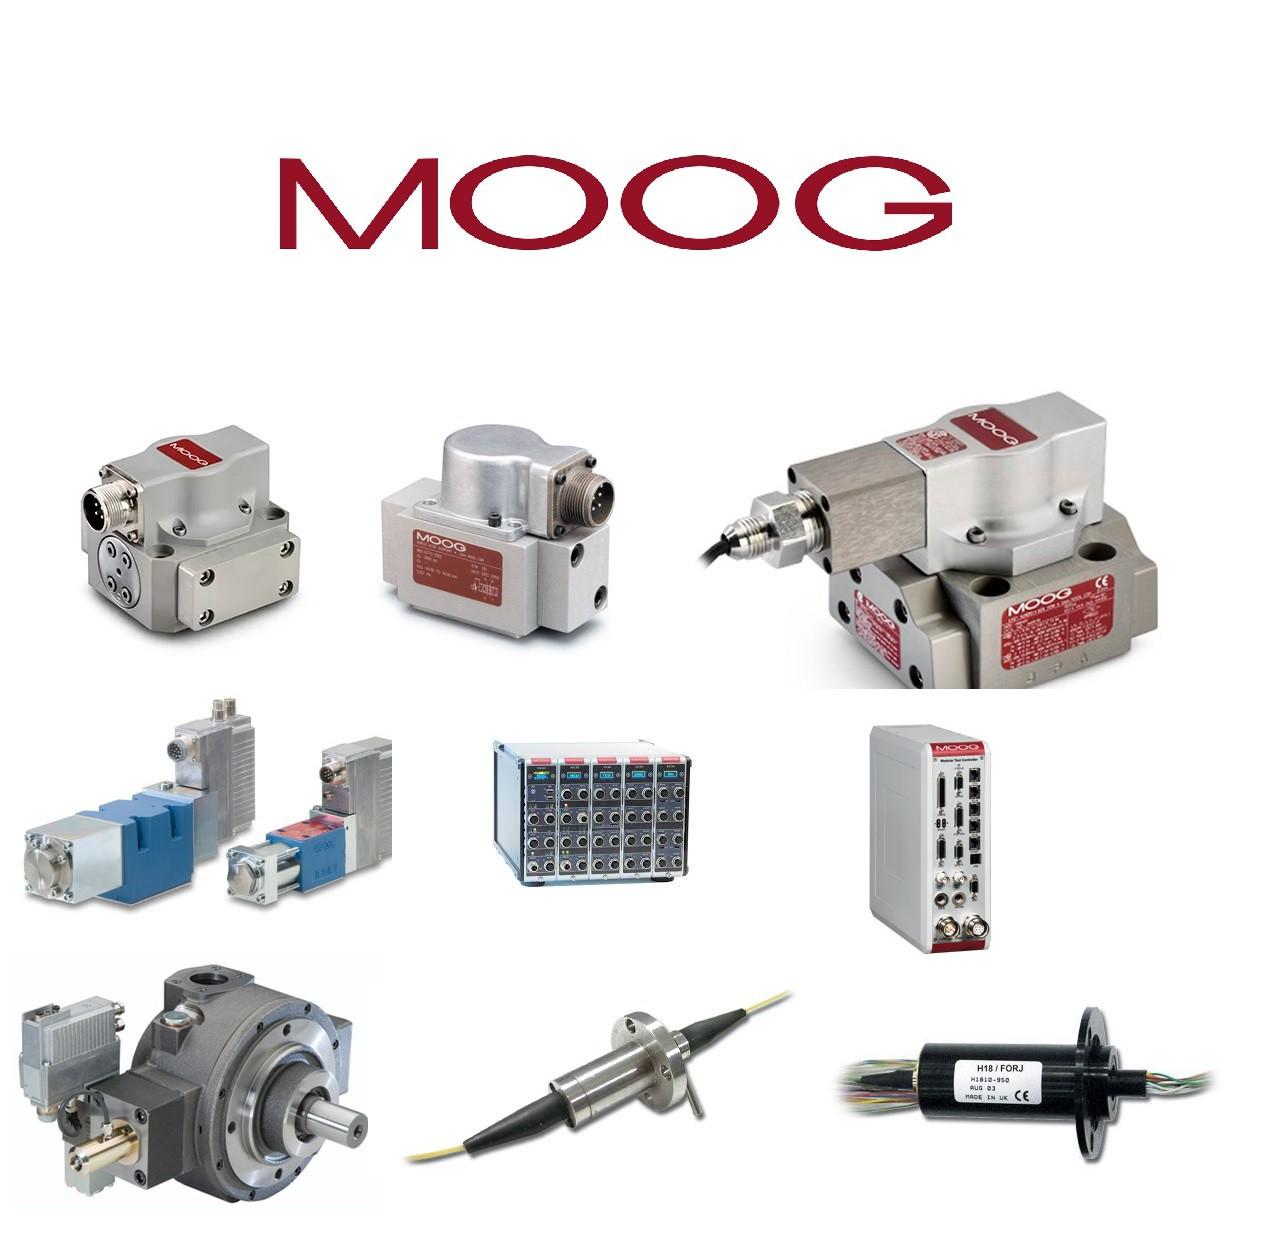 MOOG G631-3004B H 40 J O F M 4 V B R   Servo Valve